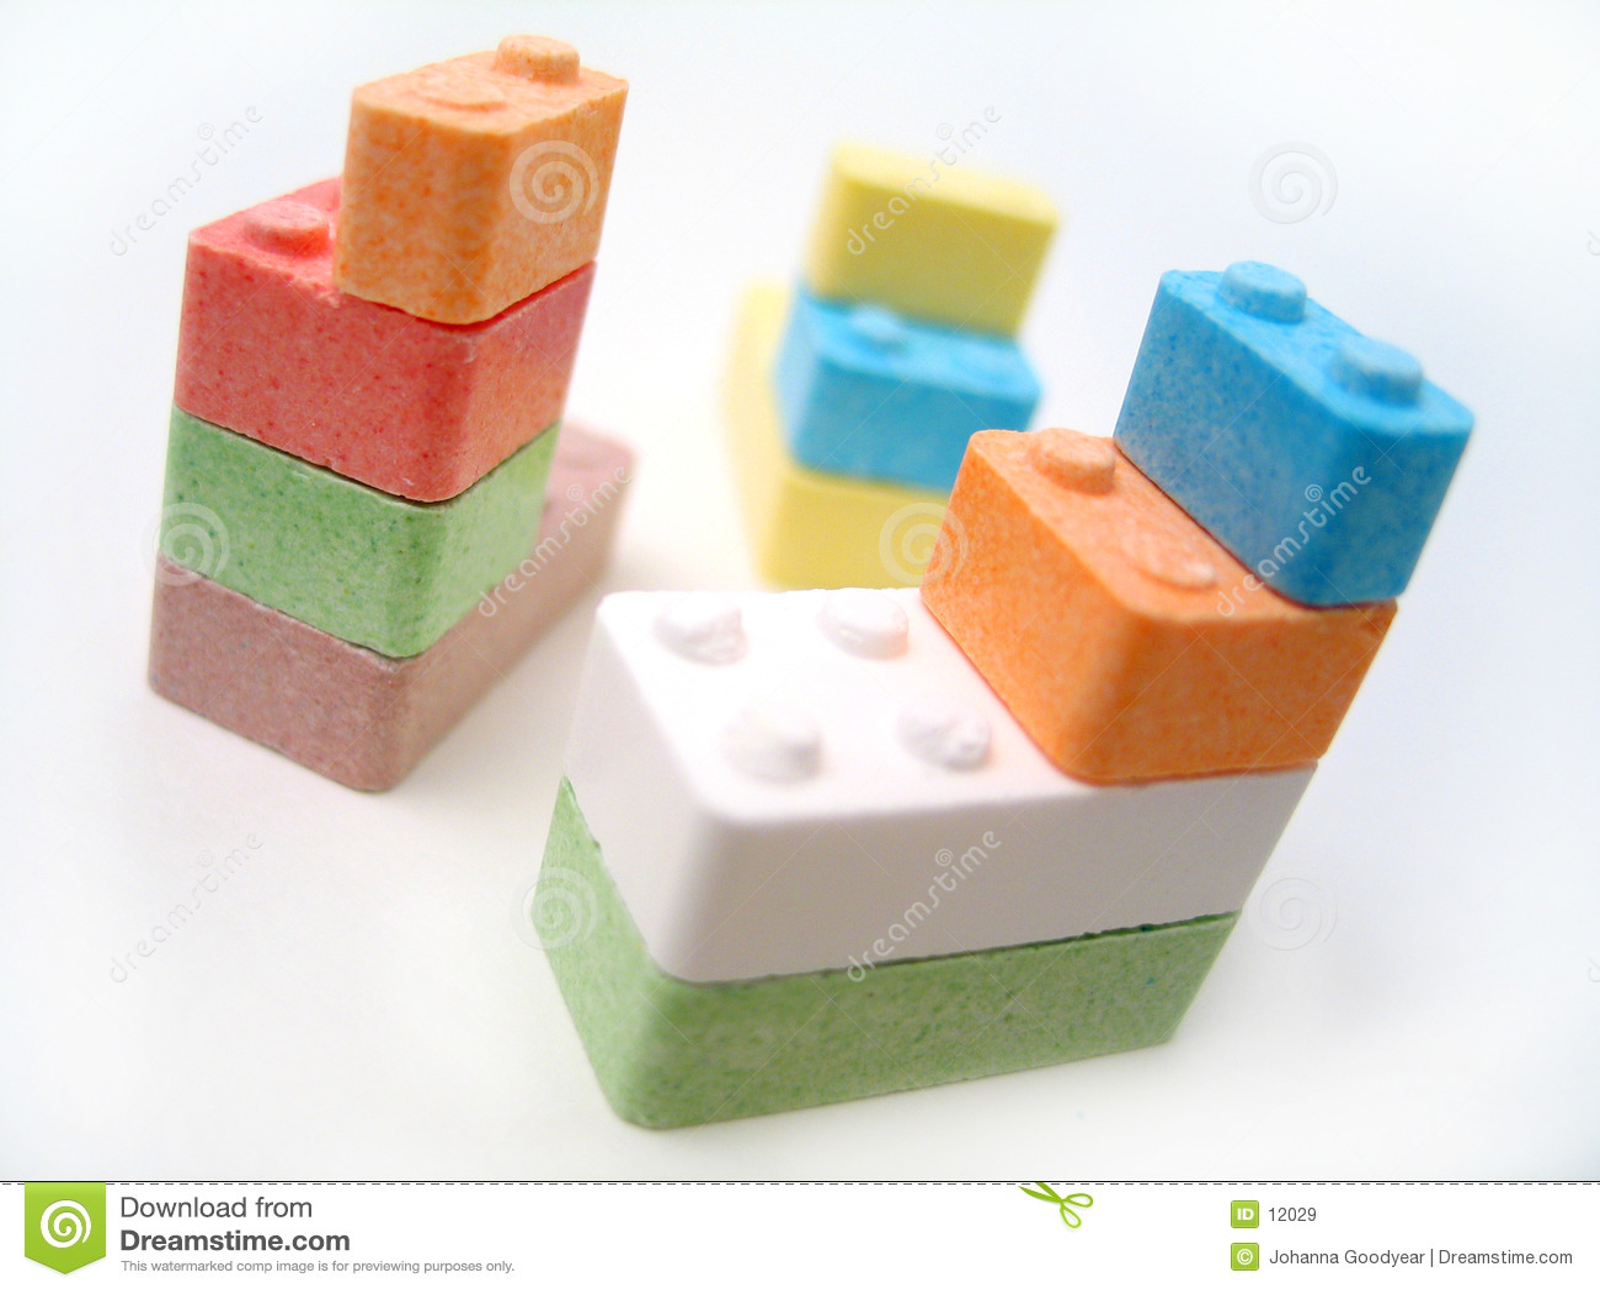 Candy Blocks II